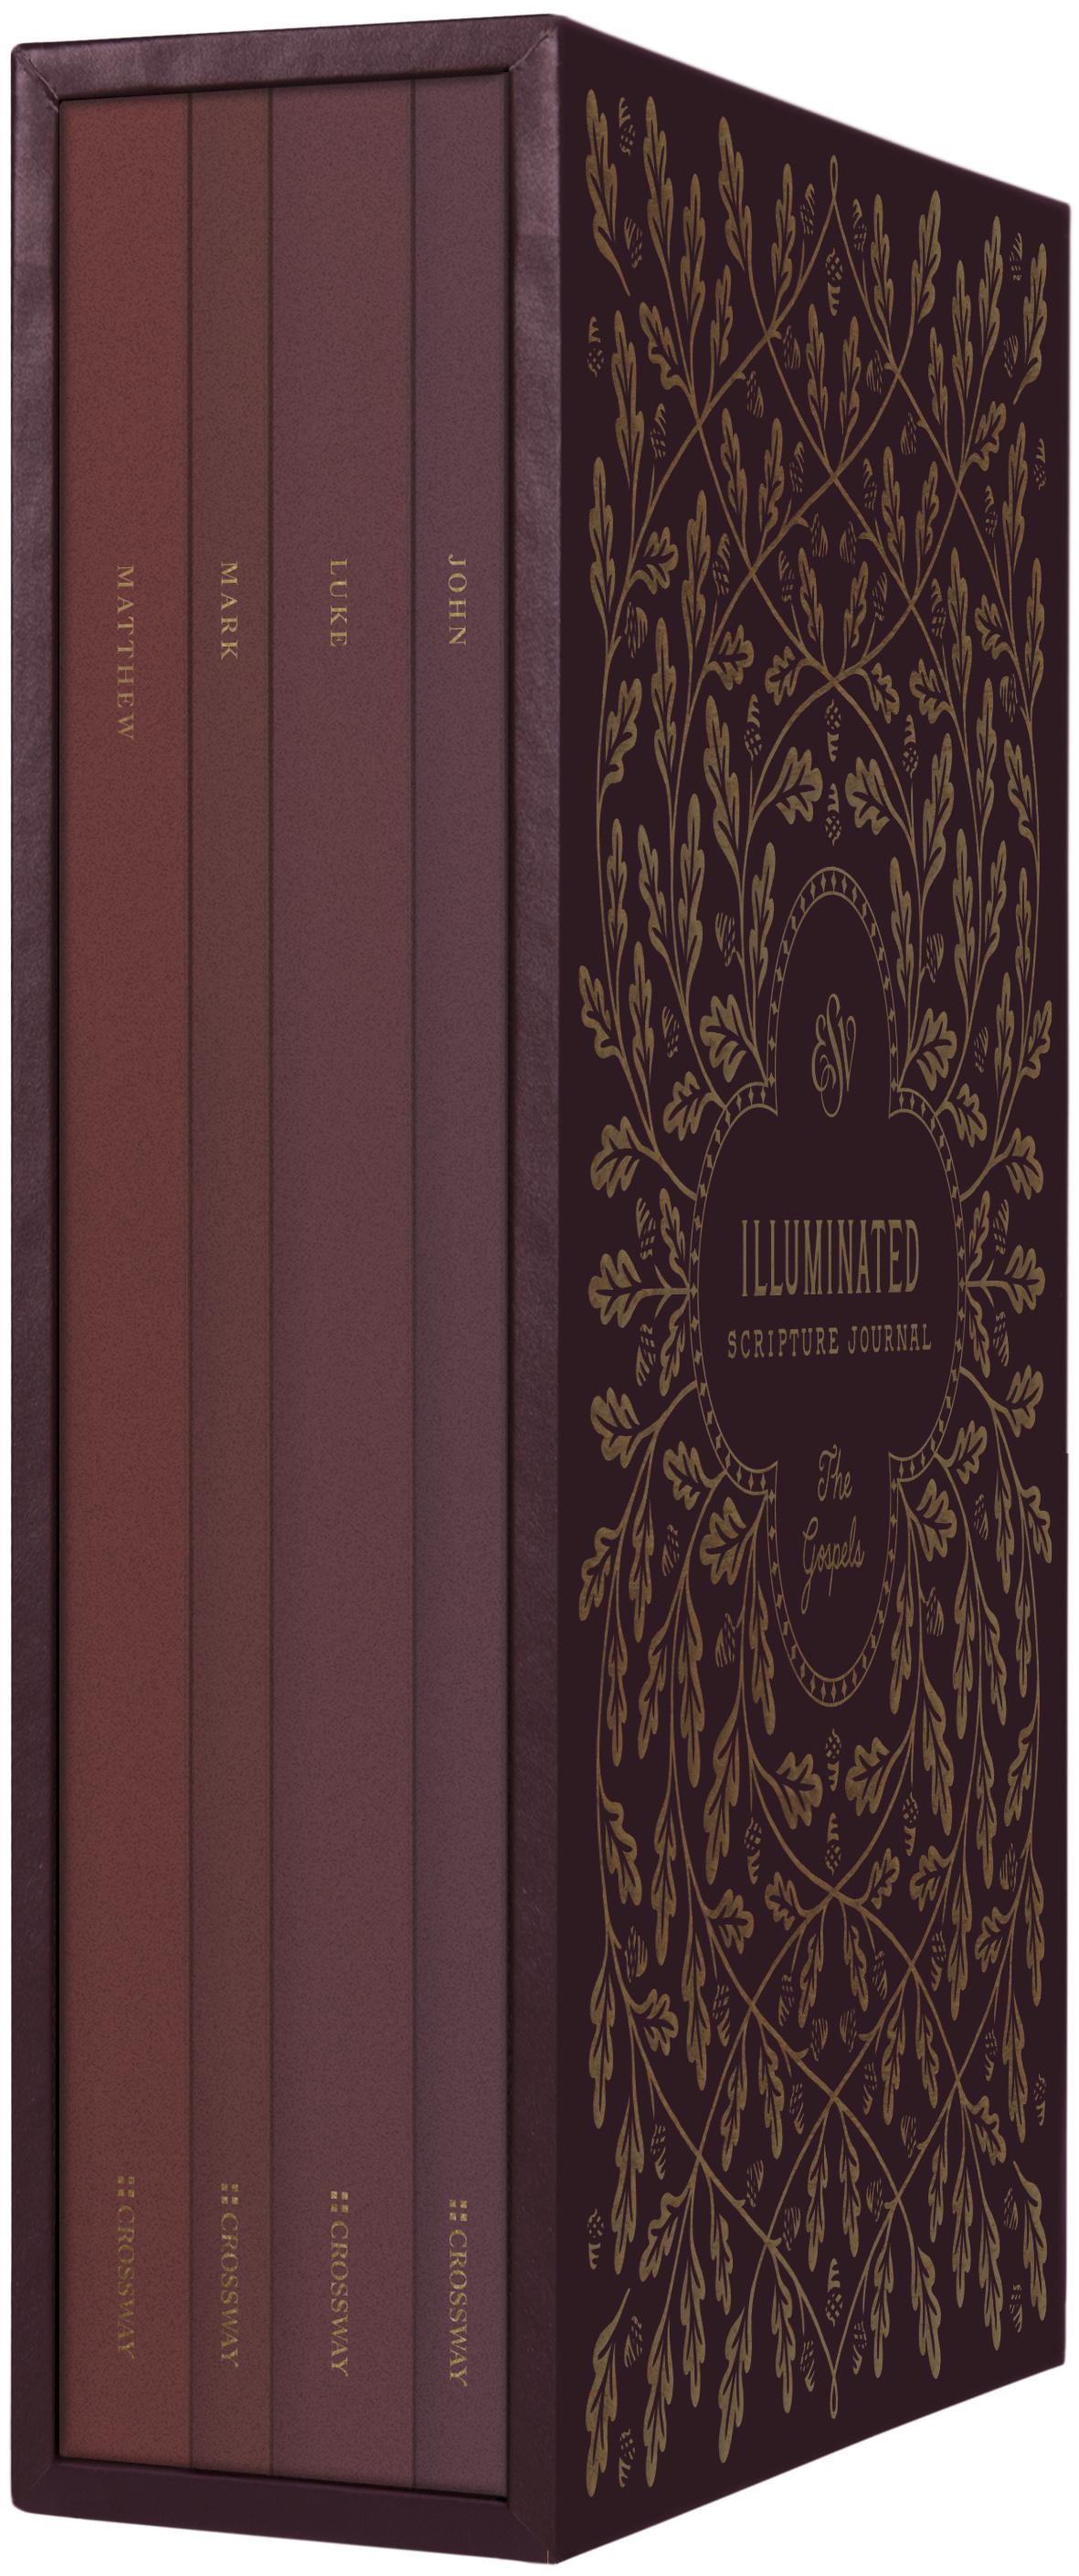 ESV Illuminated Scripture Journal: Gospels Set